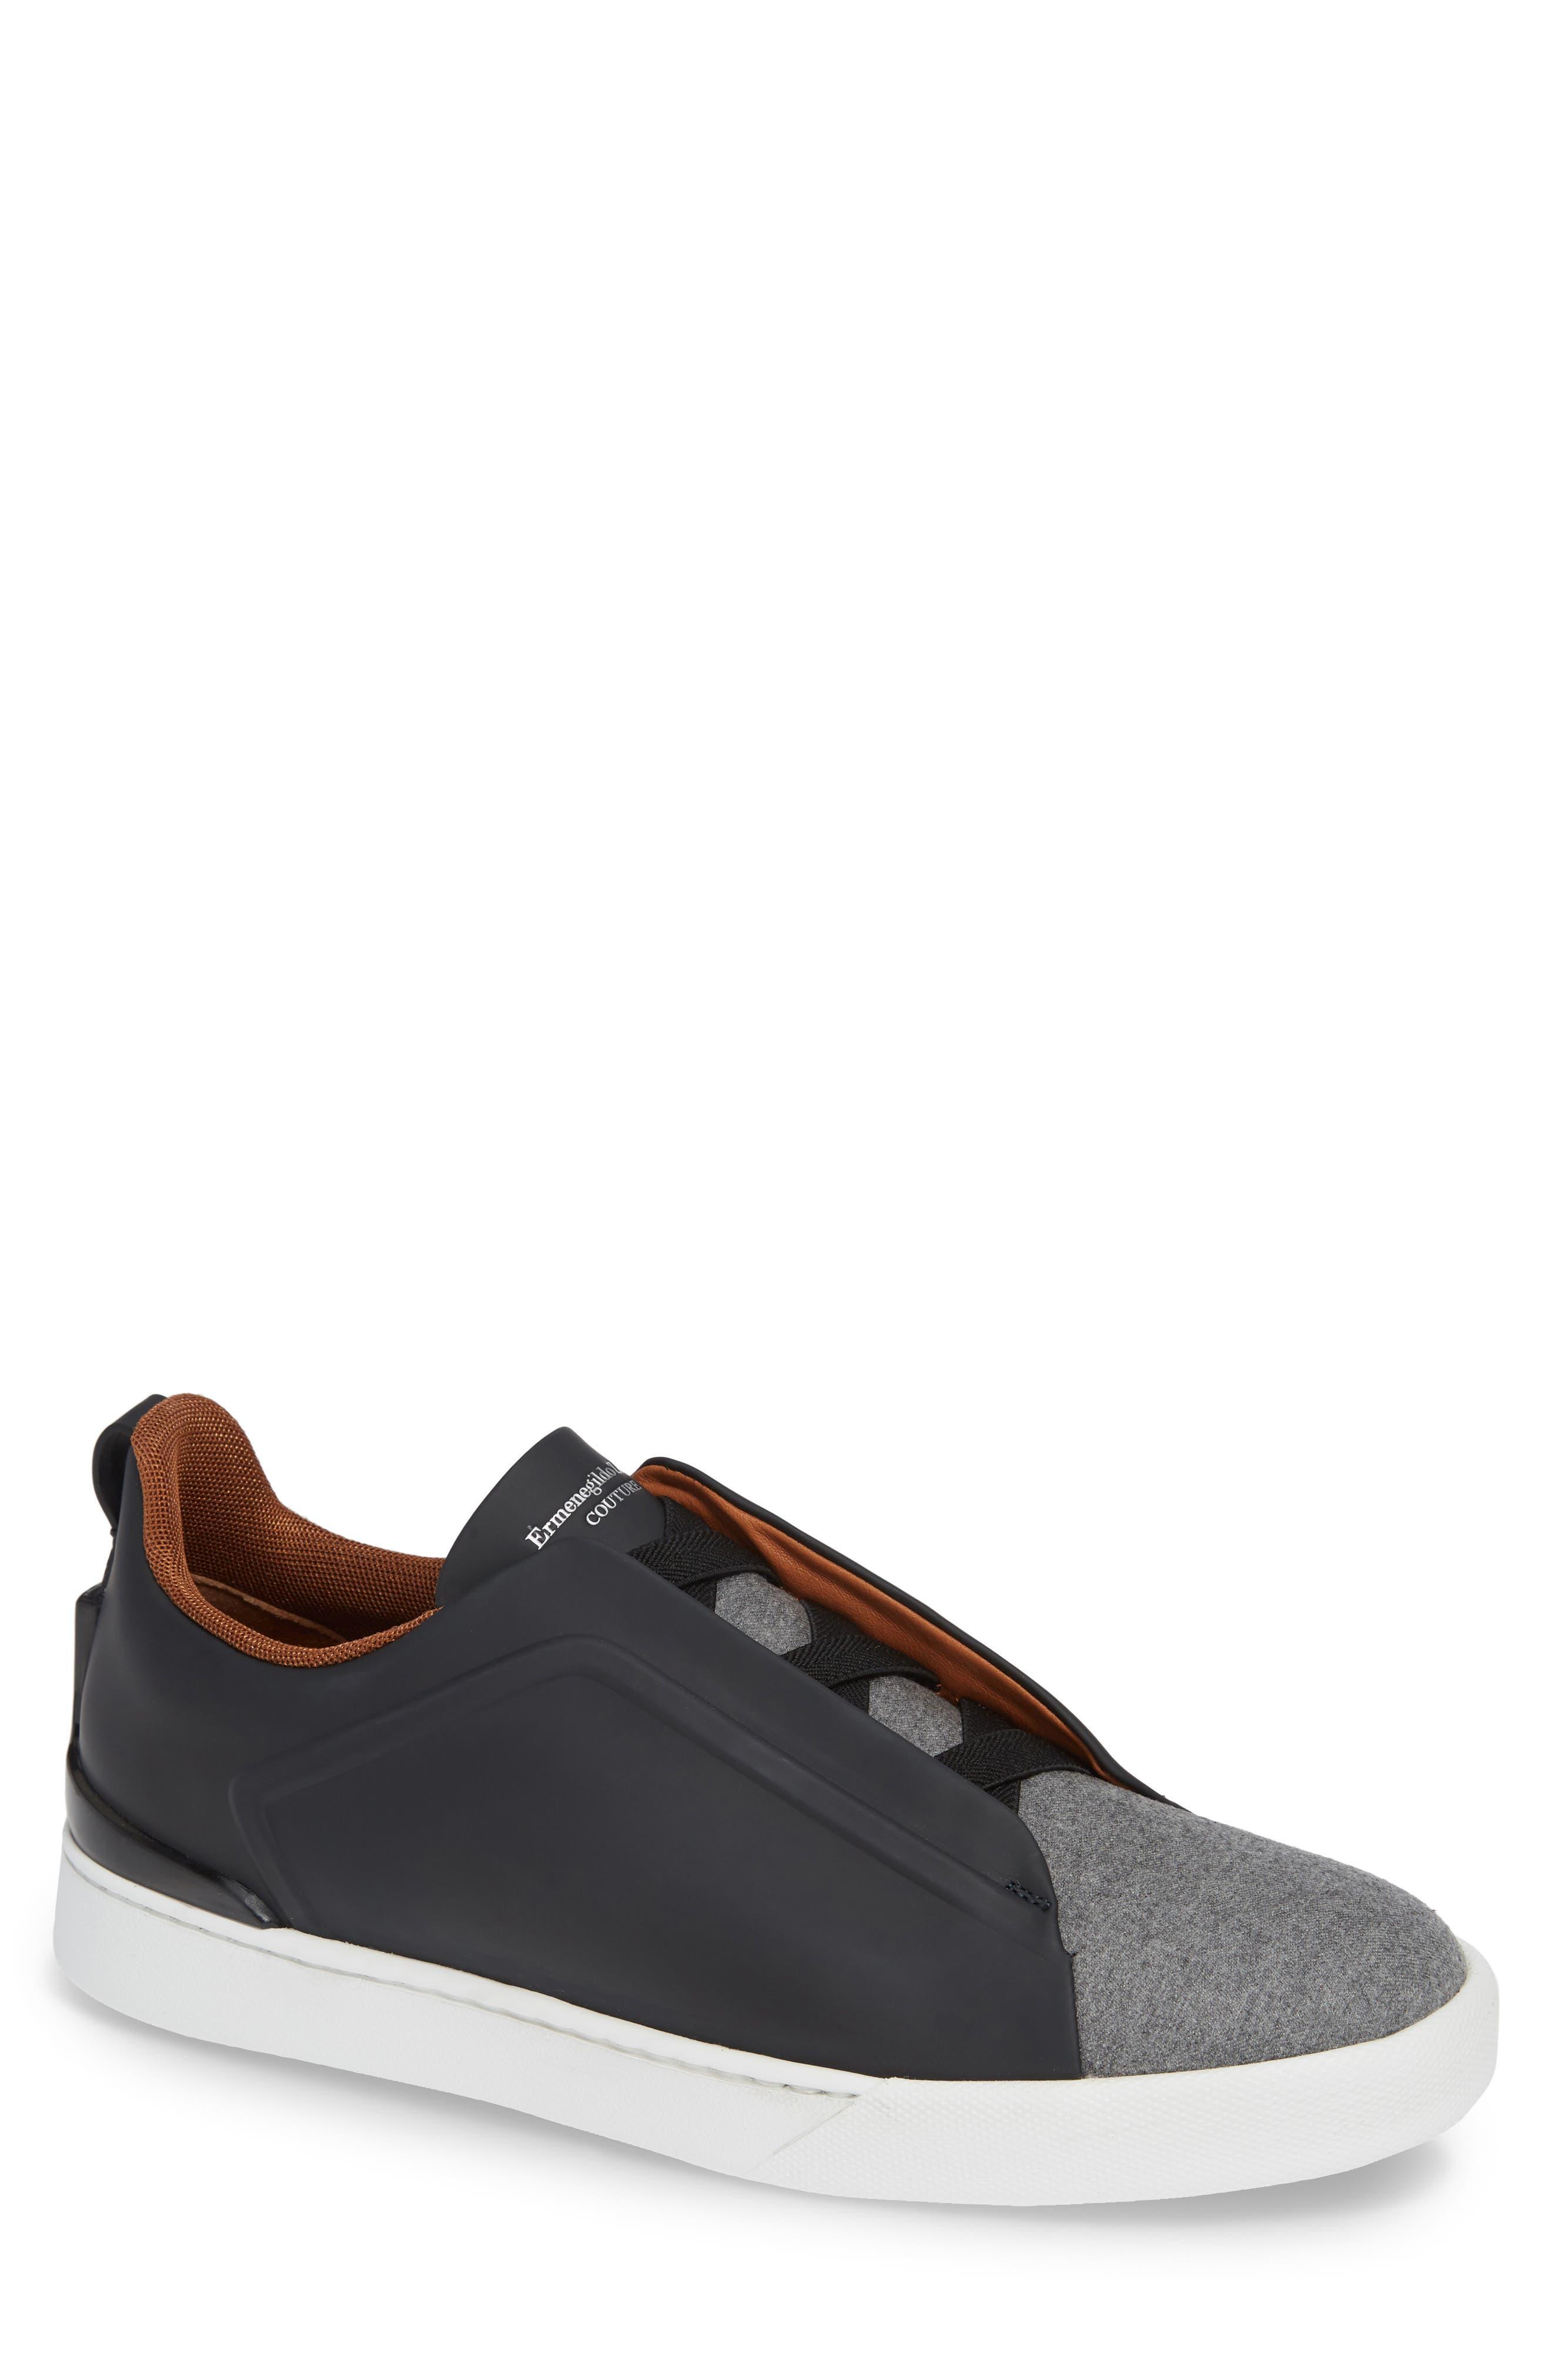 Men'S Triple-Stitch Leather/Wool Low-Top Sneakers in Navy/ Grey